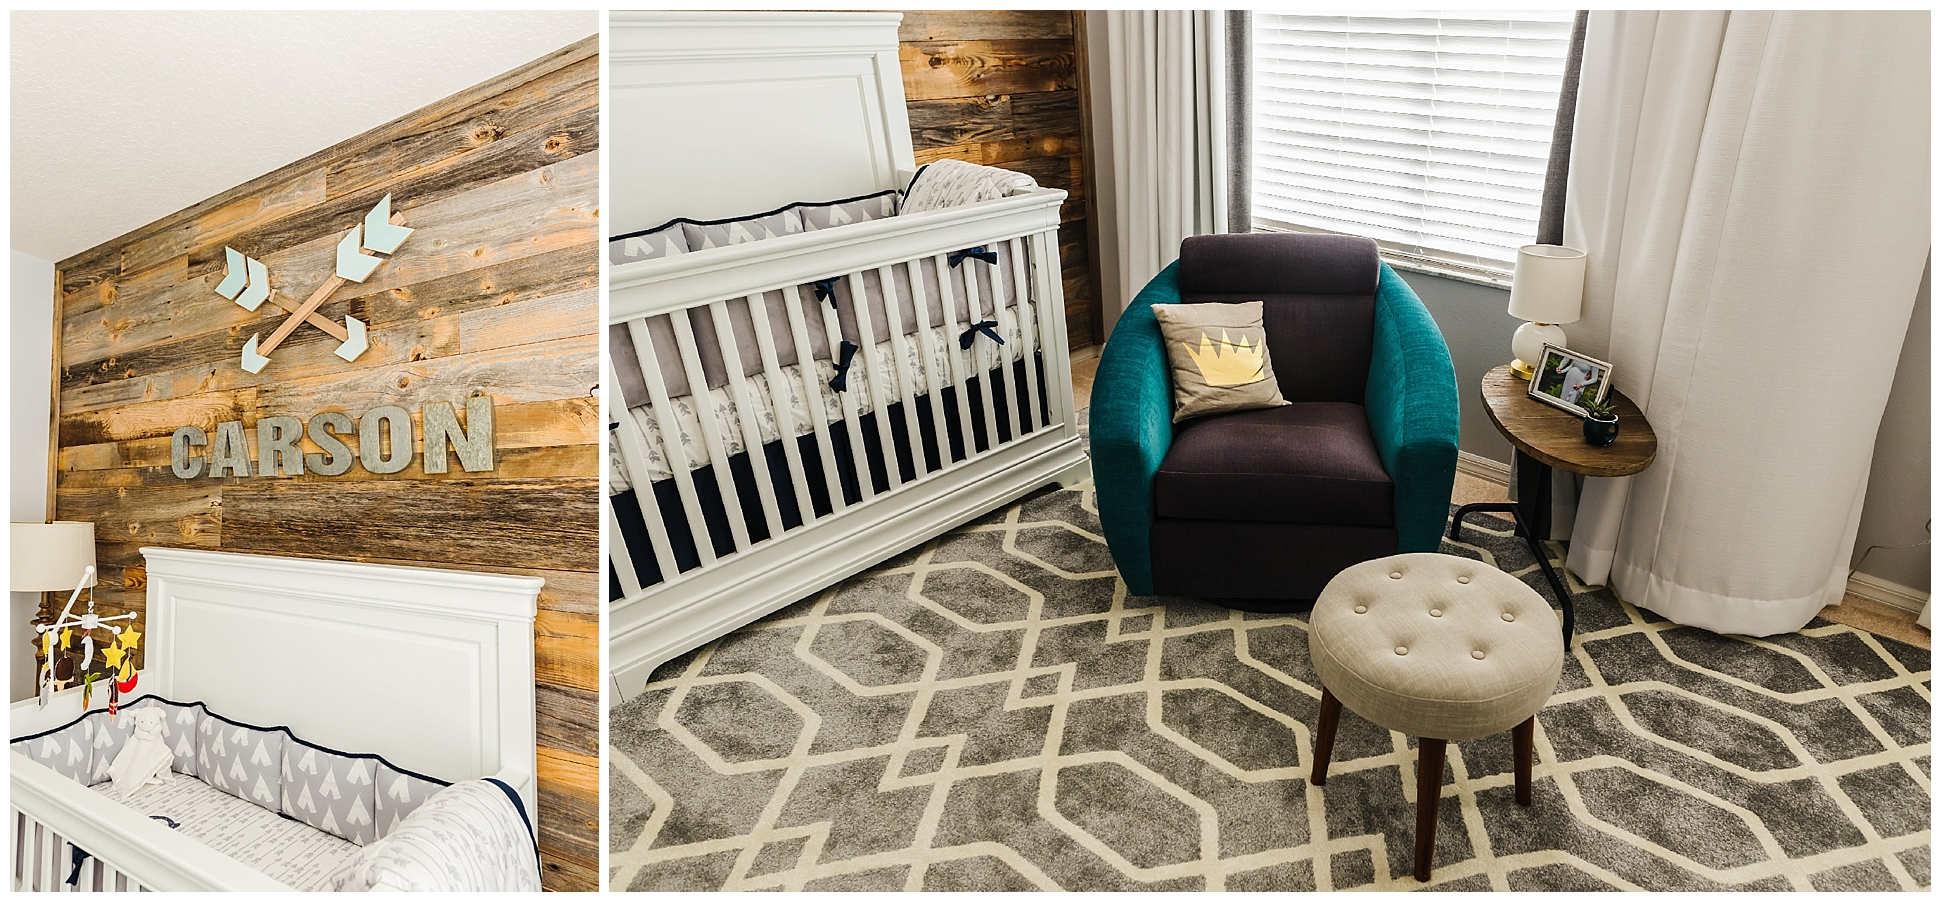 ann-cox-interior-design-nursery-where-the-wild-things-are_4.jpg